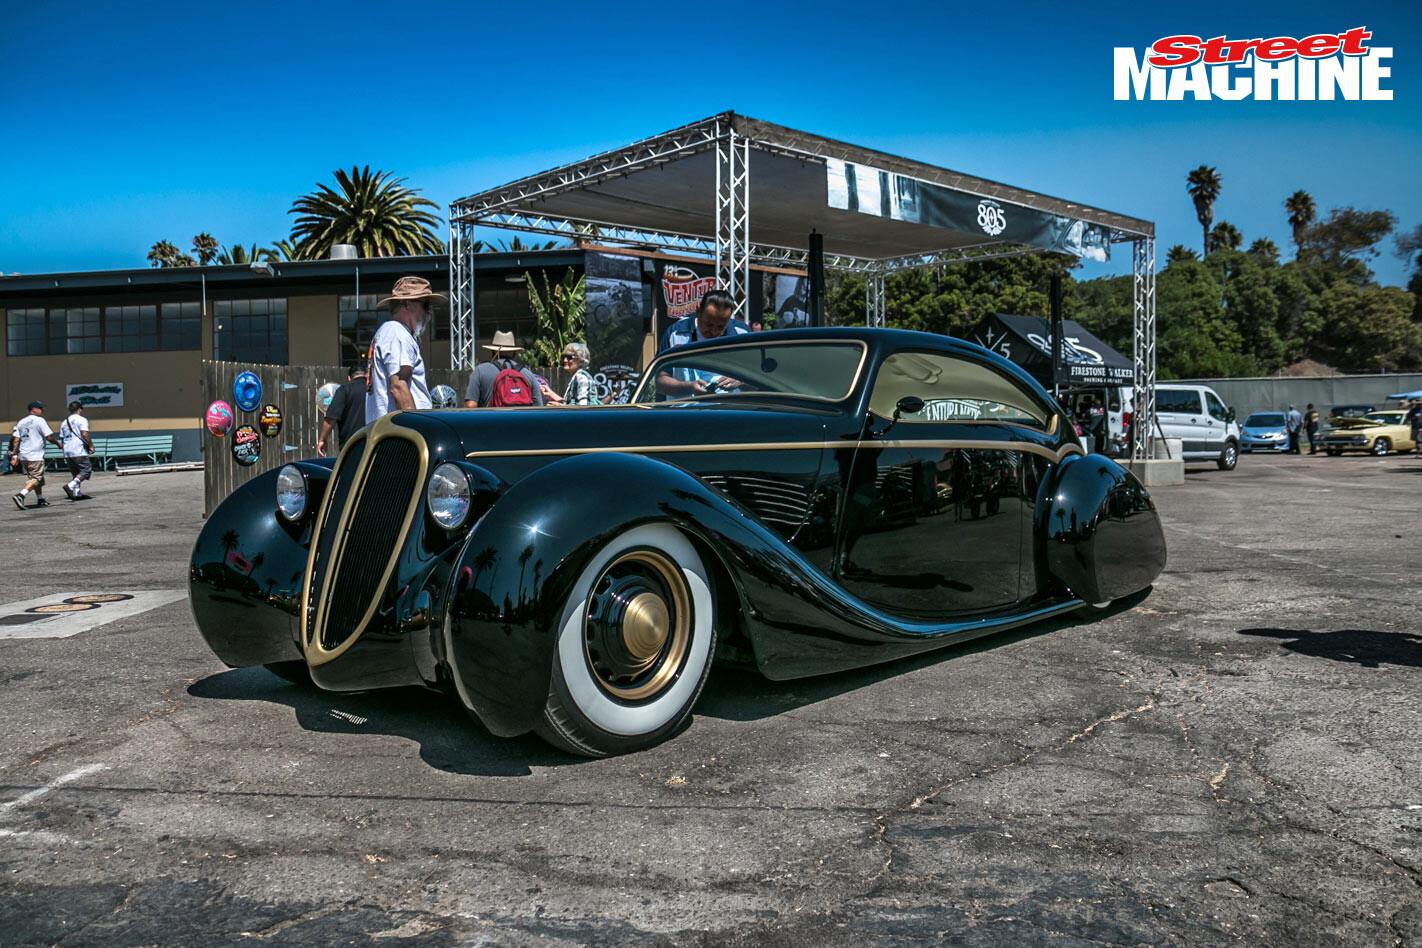 James Hetfield's Black Pearl coupe